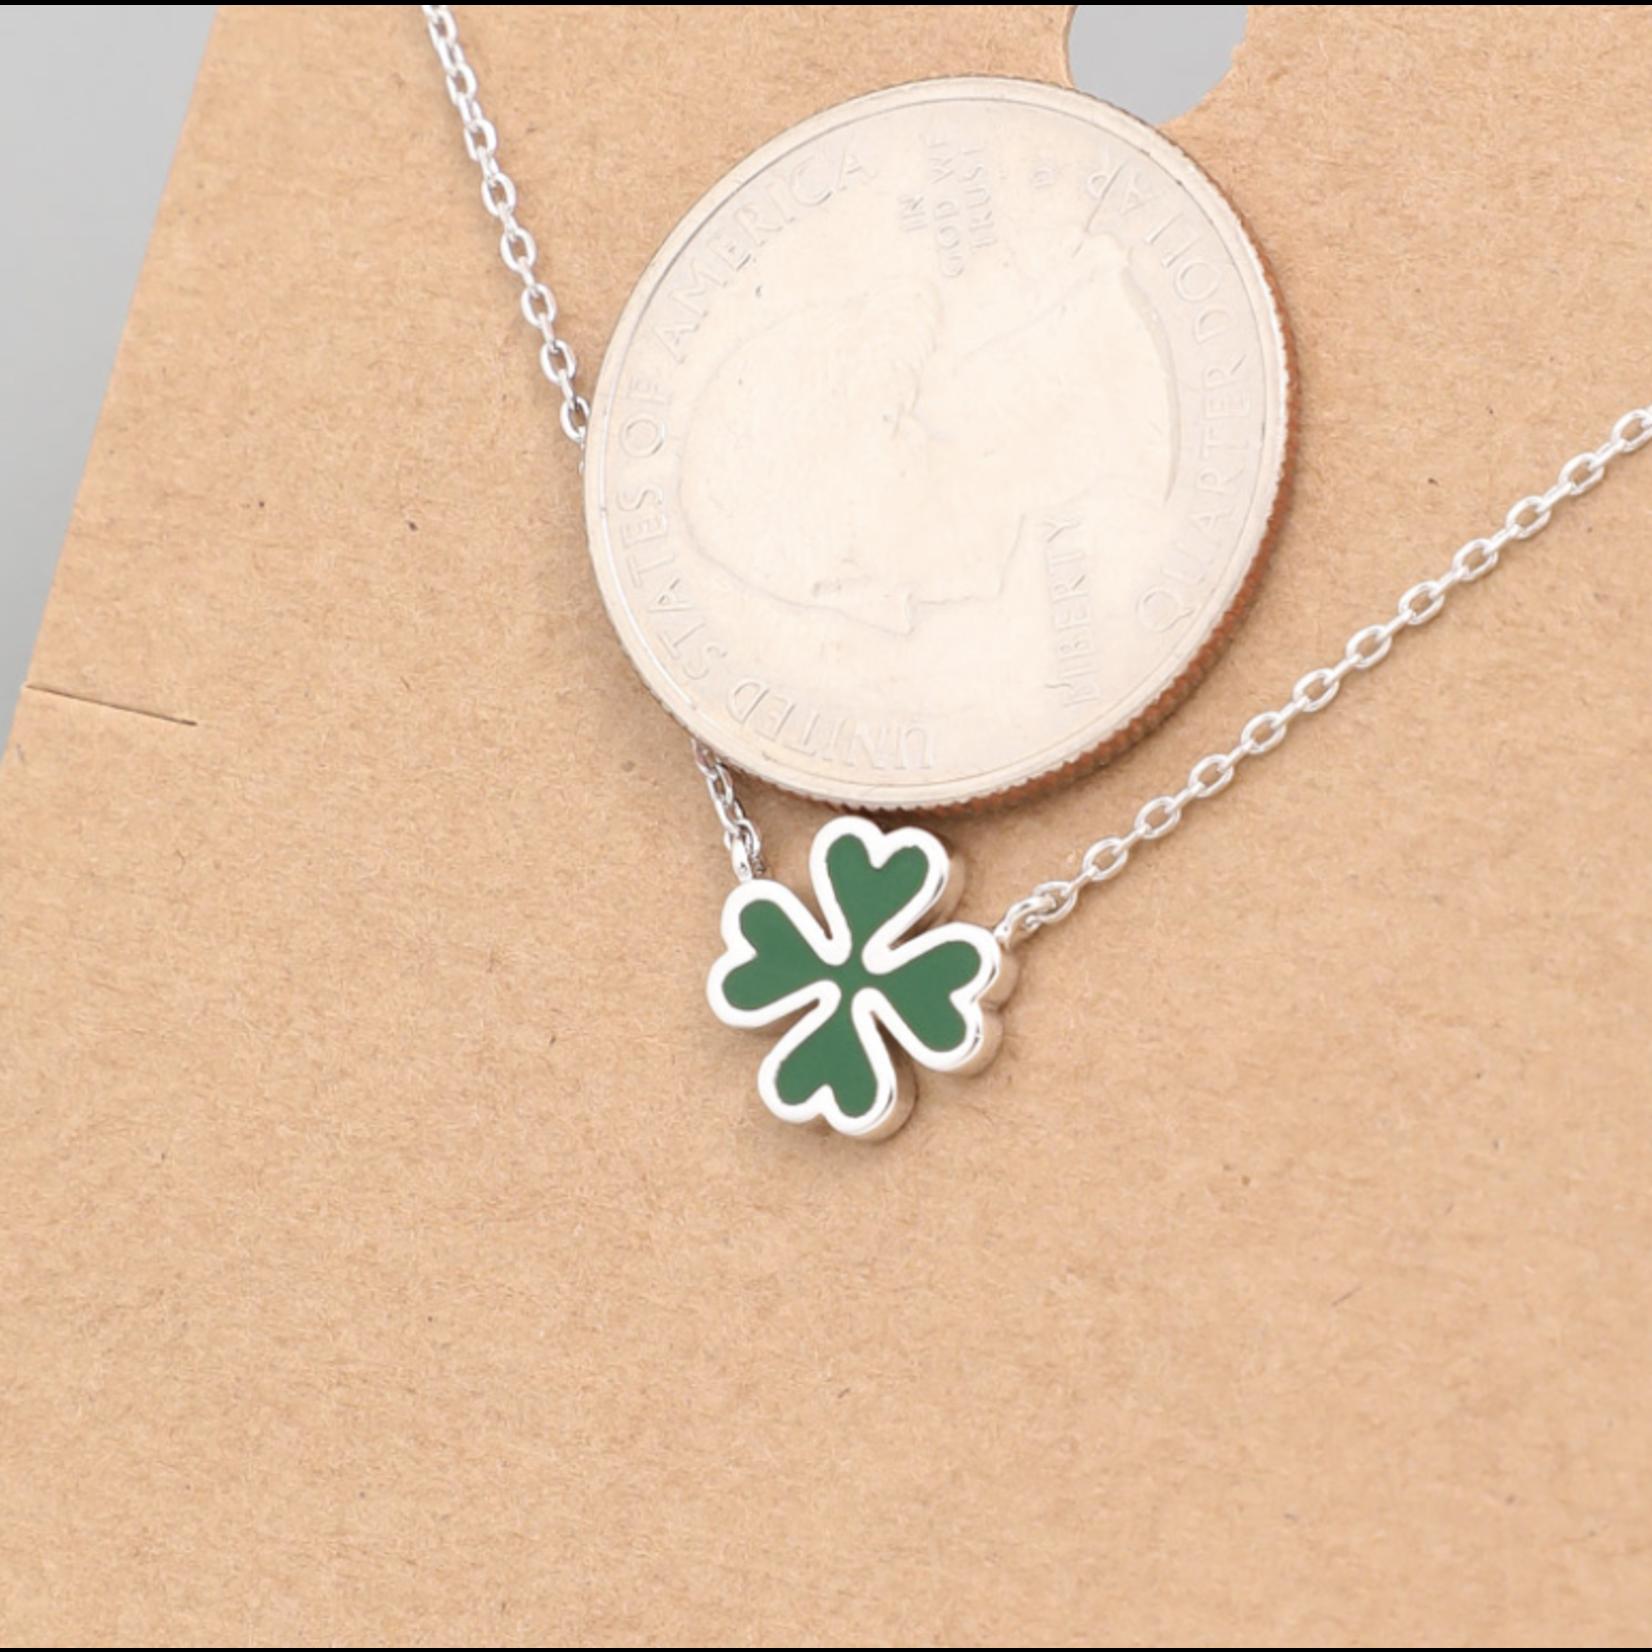 Necklace - Clover - Silver